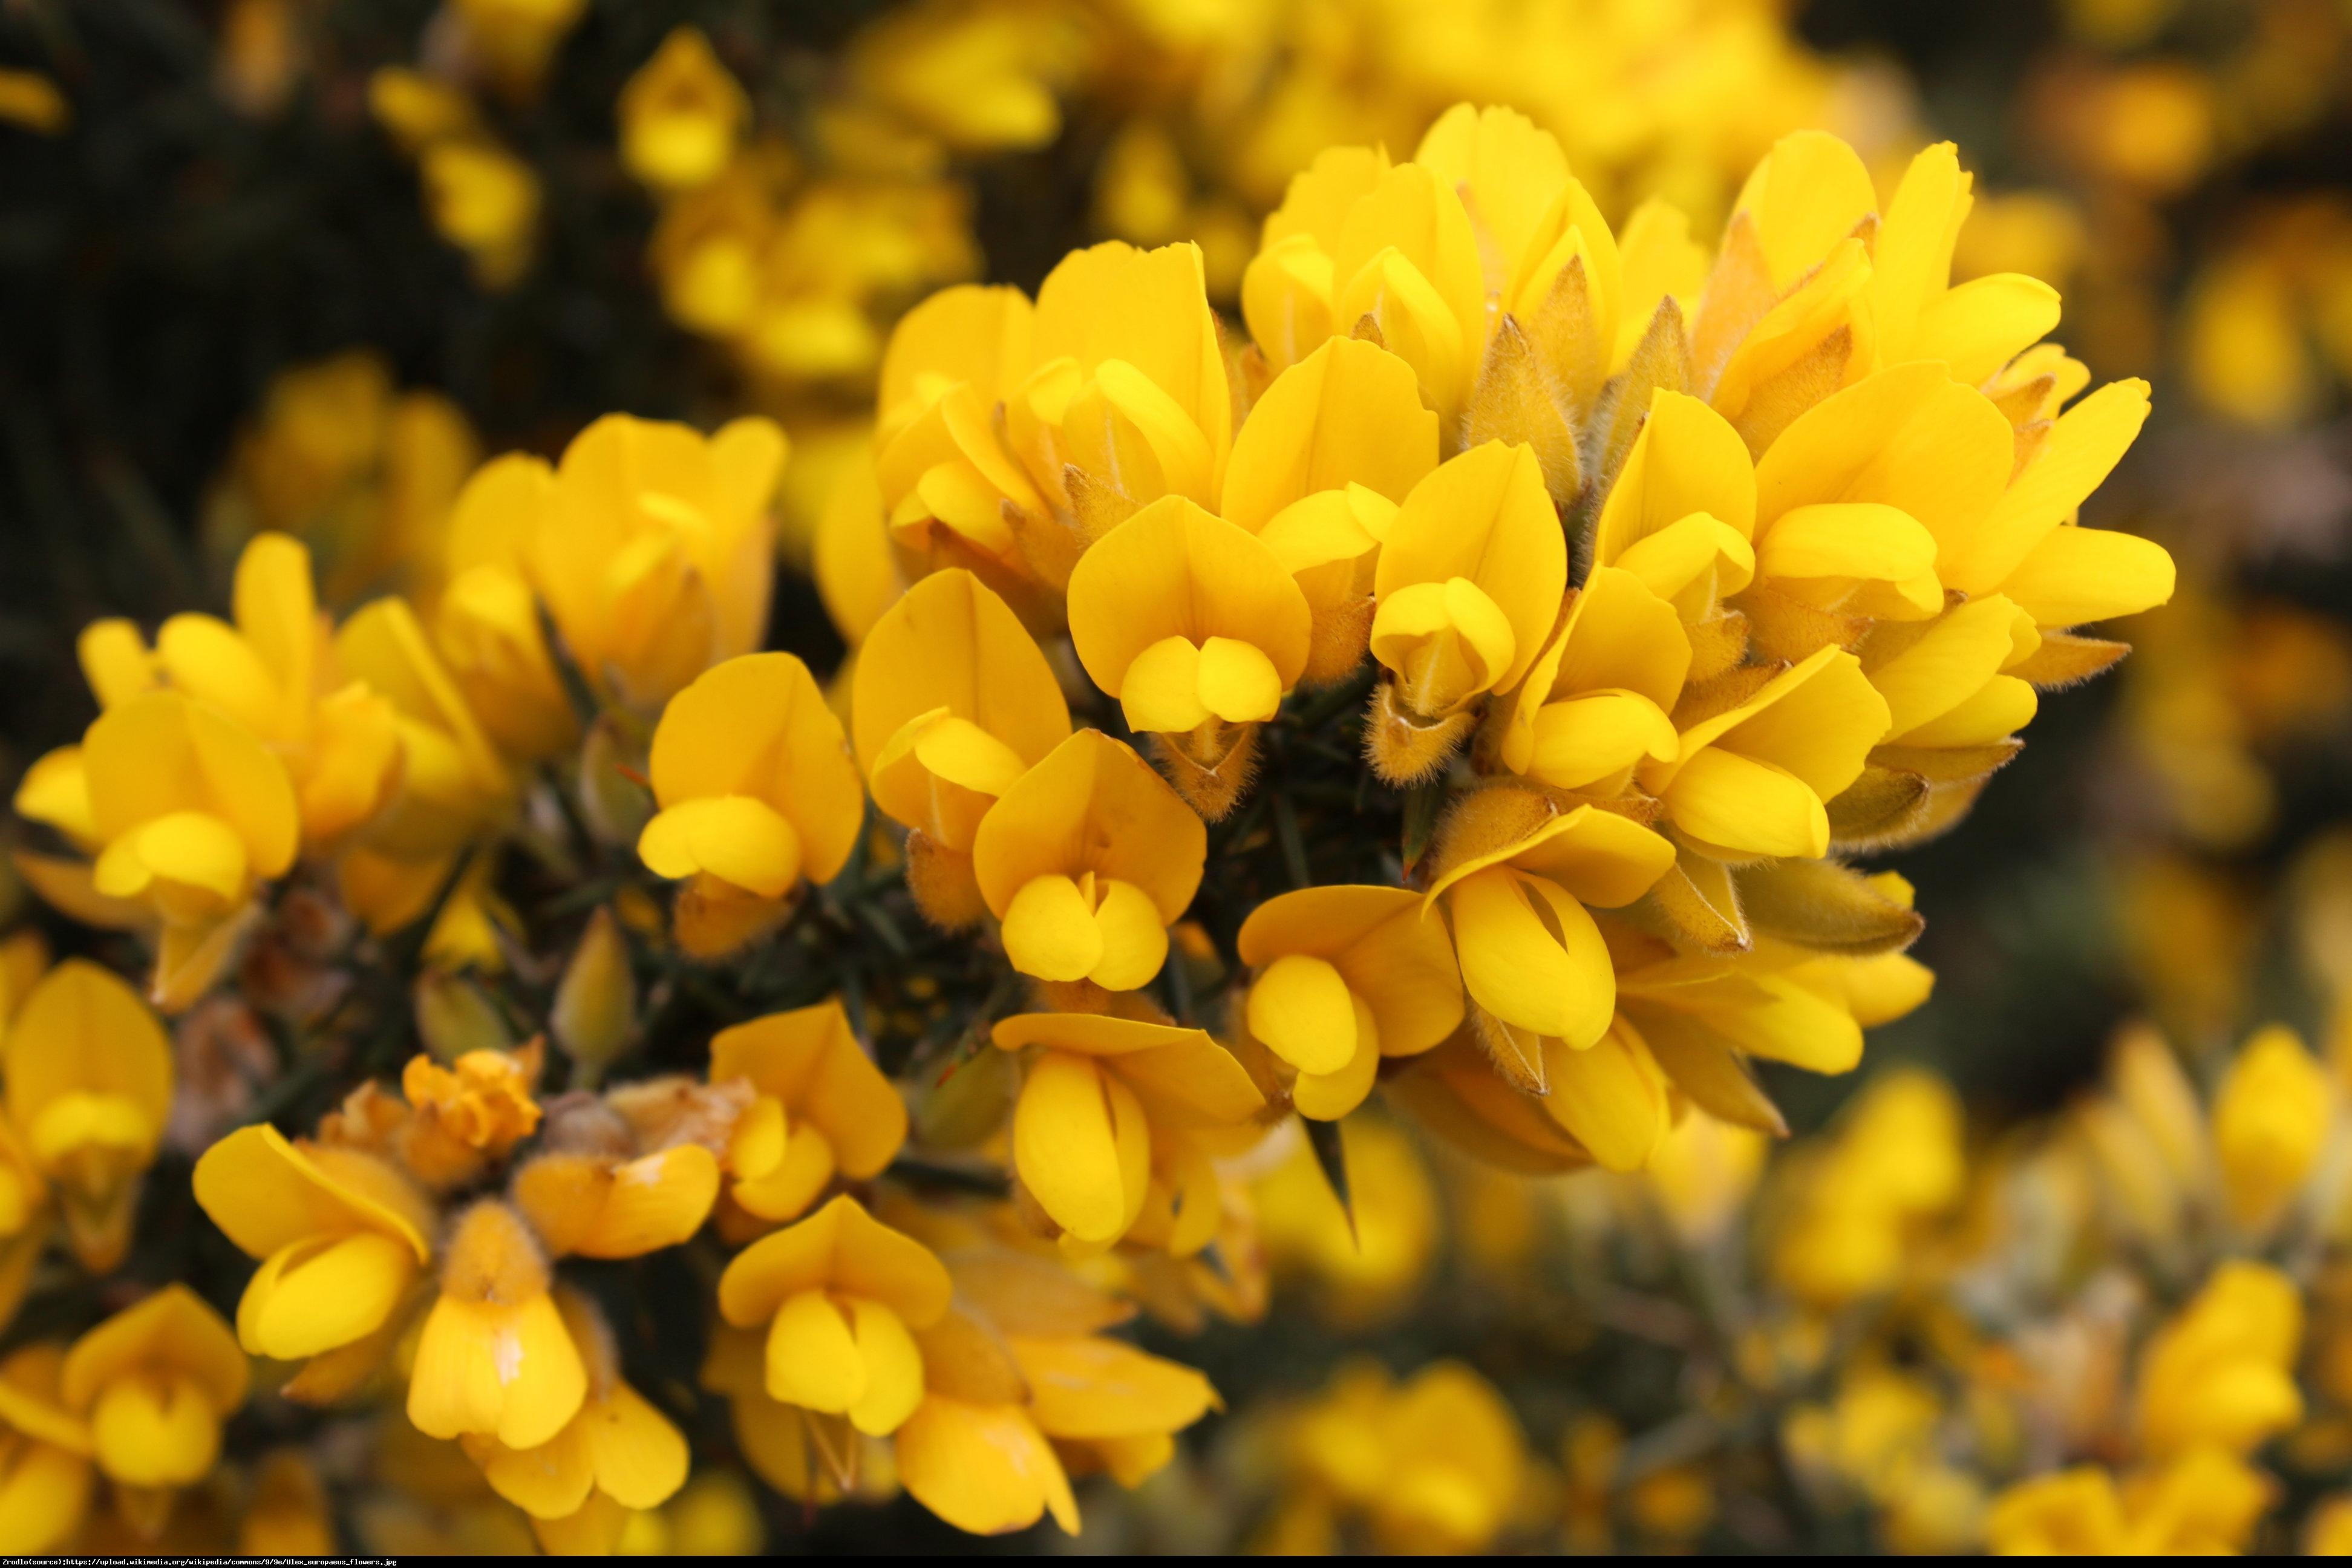 Kolcolist zachodni - Ulex europaeus